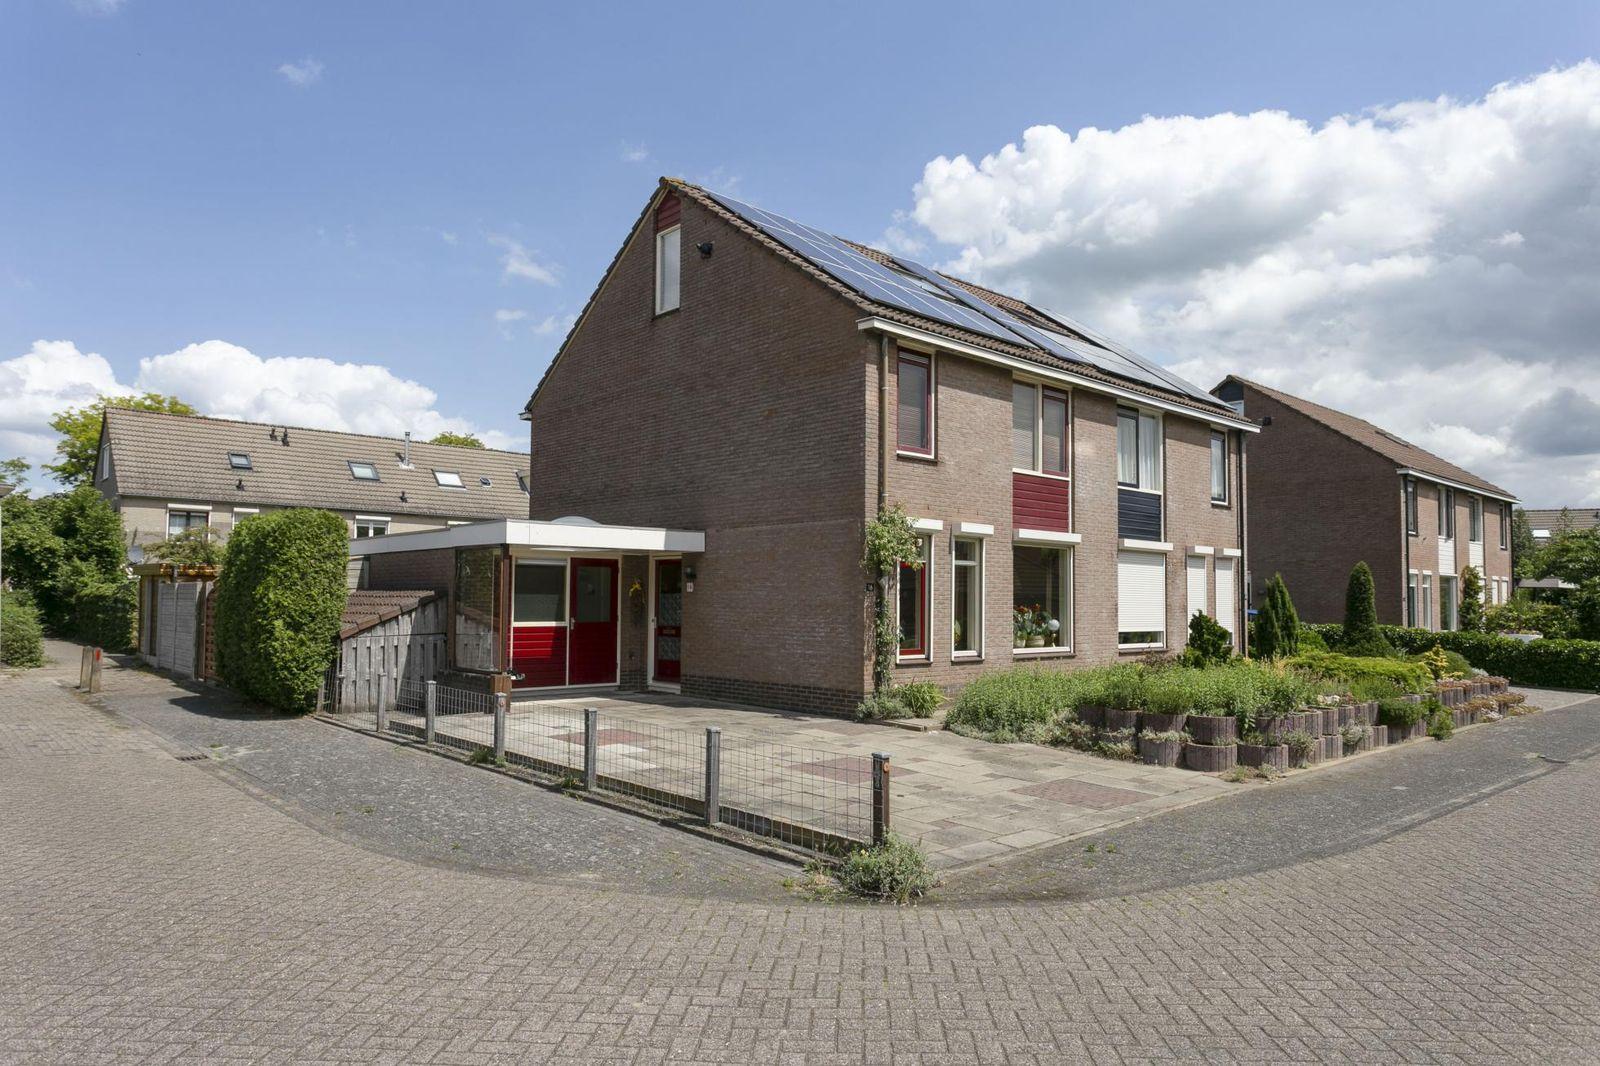 St. Anthoniehof 16, Warnsveld